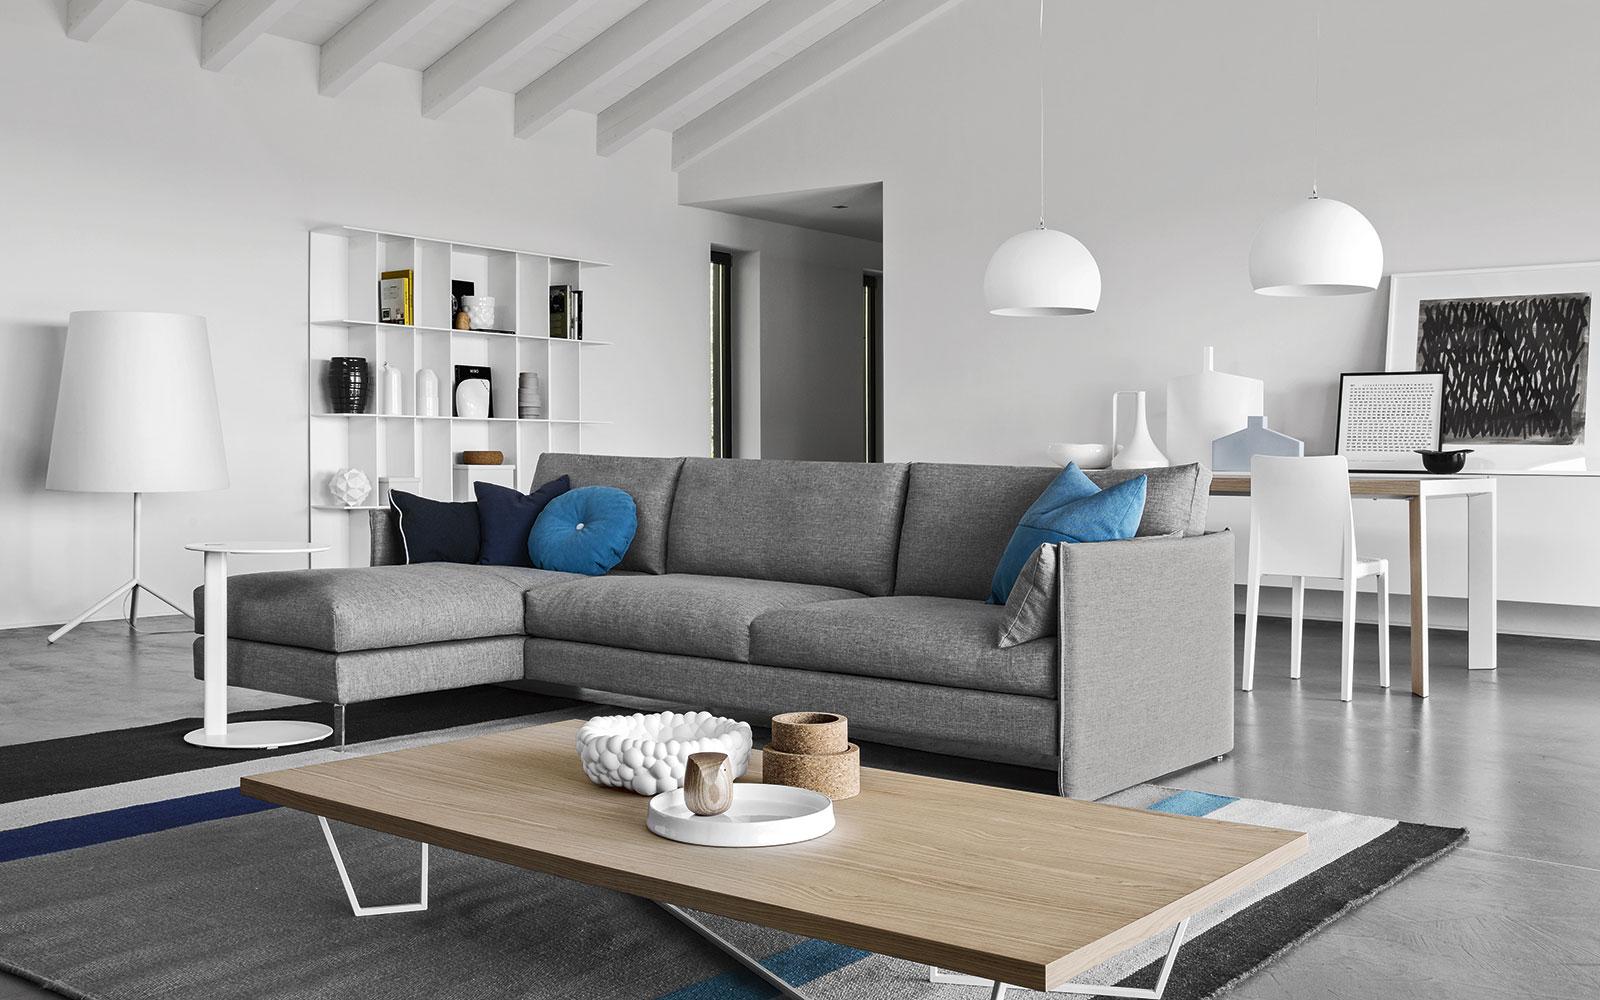 Sedie Sala Da Pranzo Calligaris : Sedie sala da pranzo calligaris. fabulous meglio di tavoli e sedie